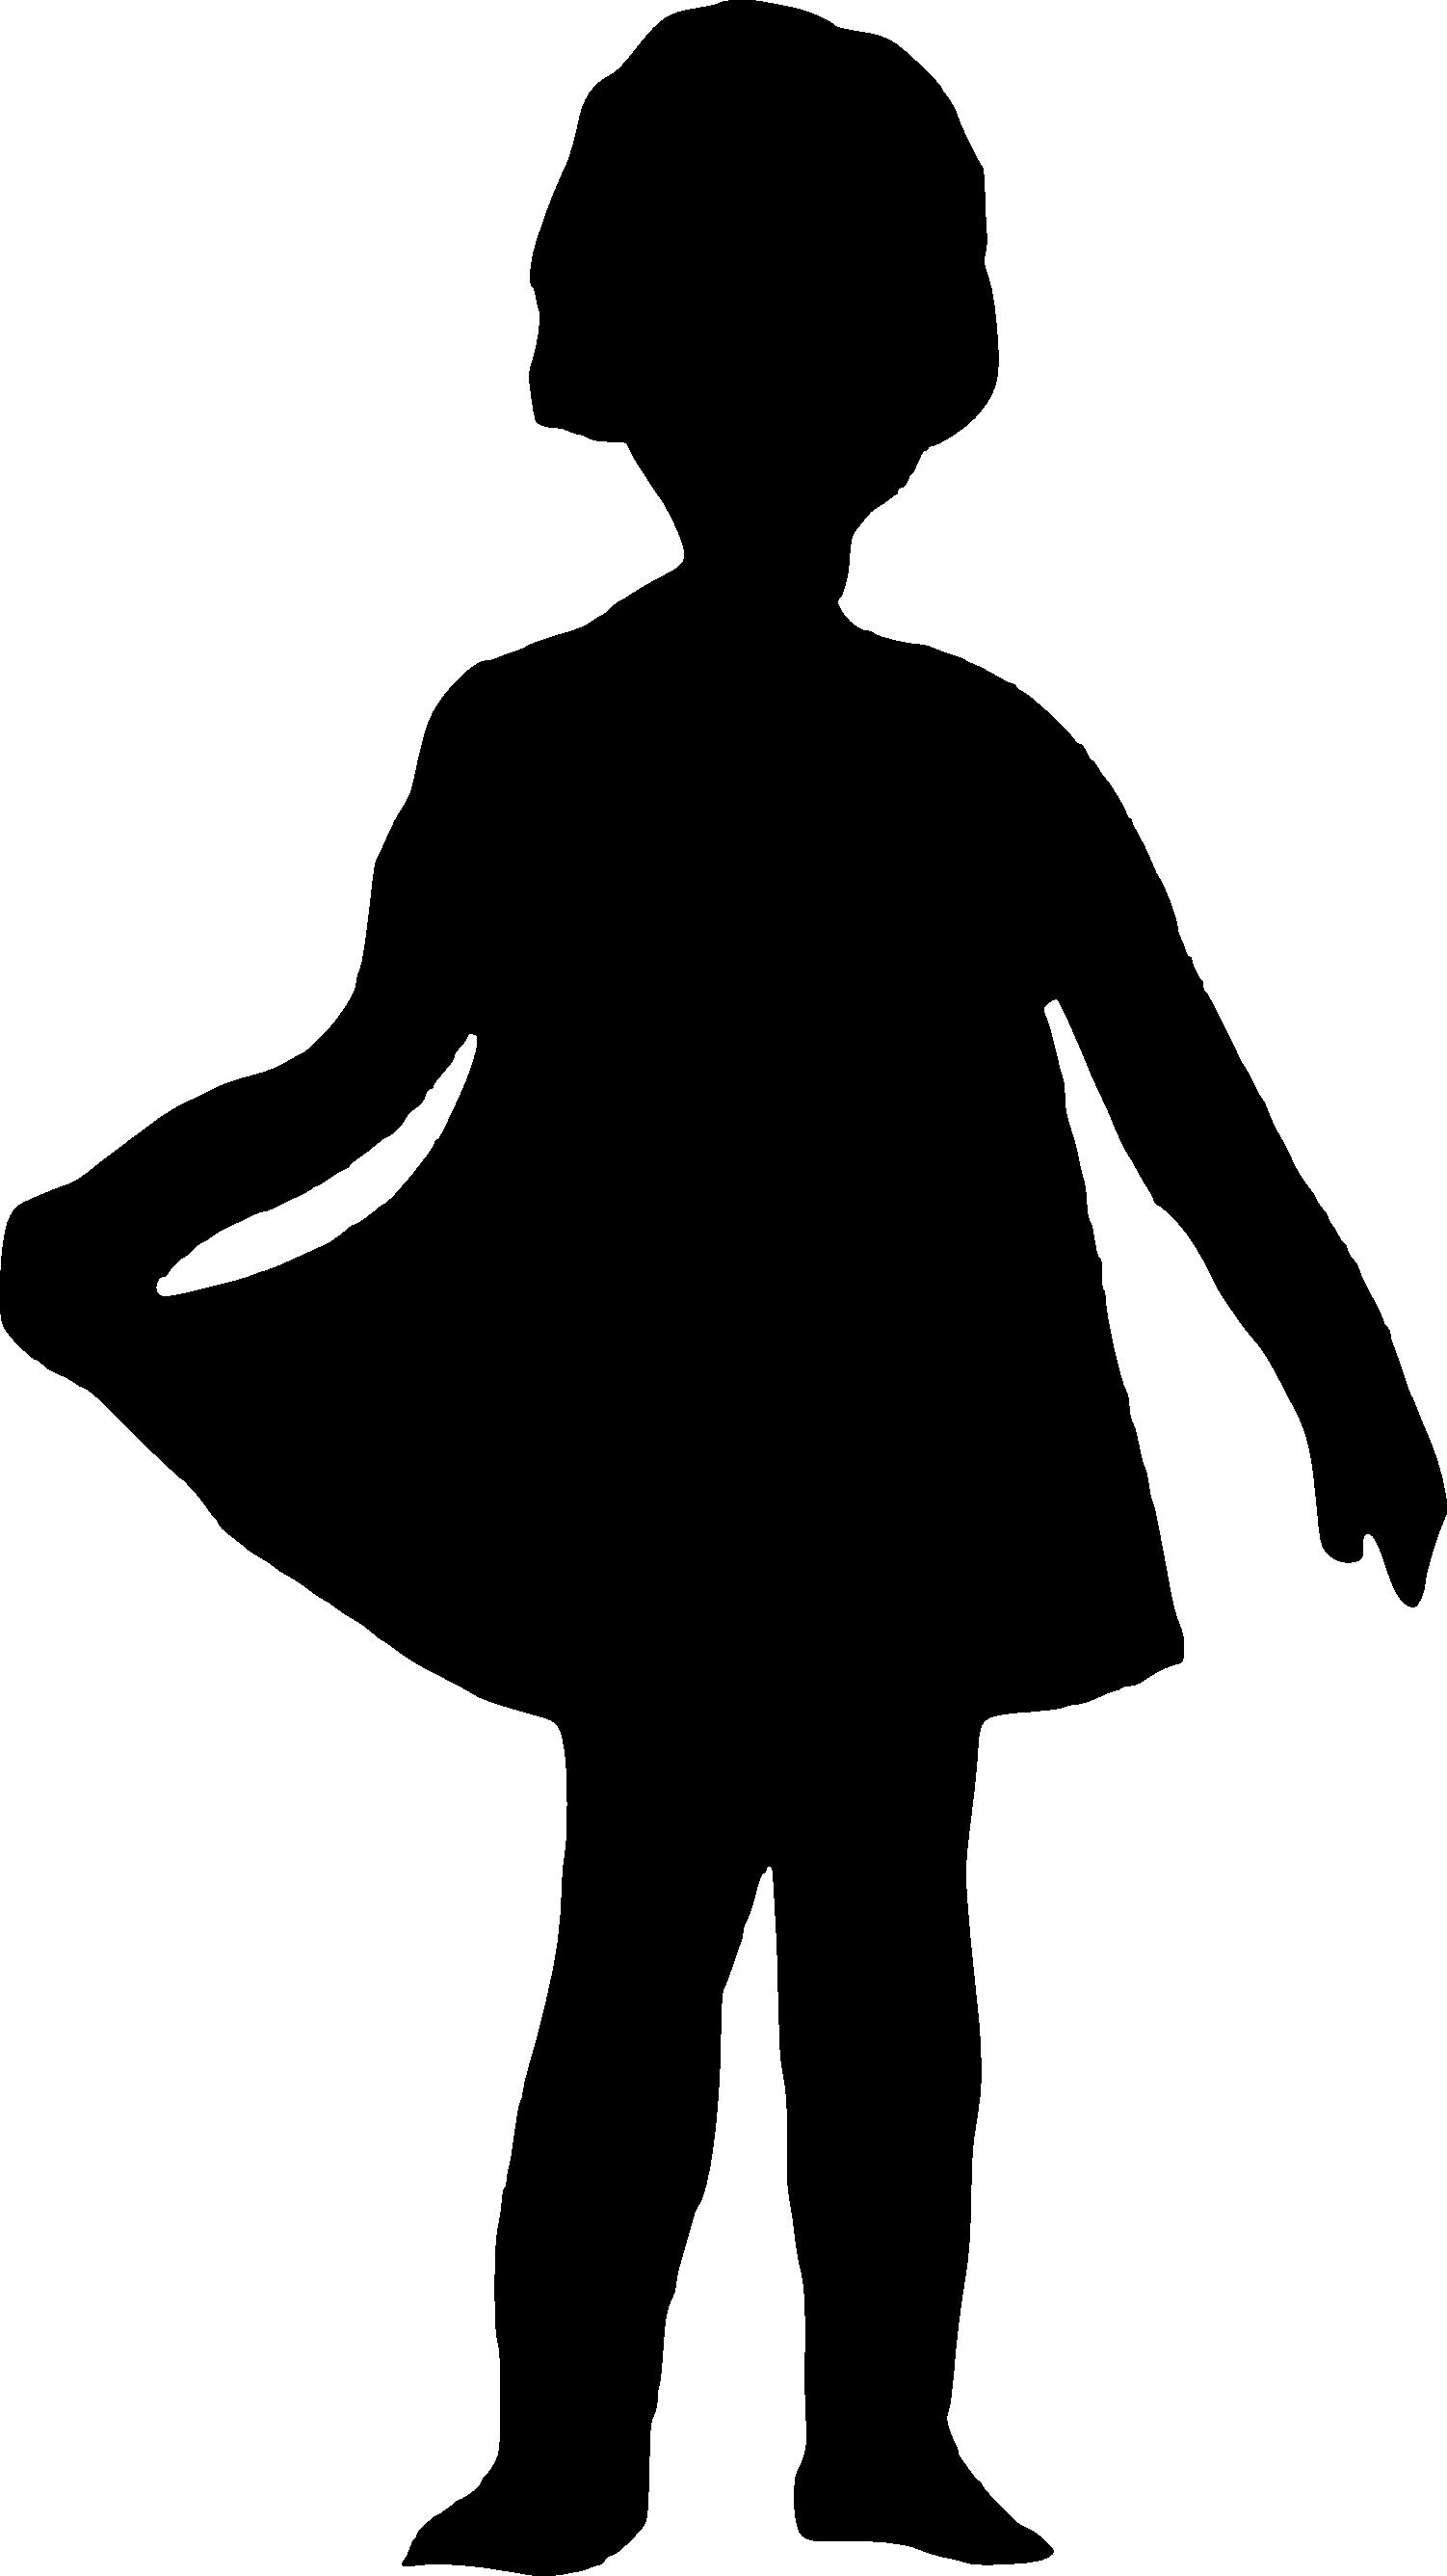 File:Girl silhouette black.svg - Wikimedia Commons |Girl Silhoutte